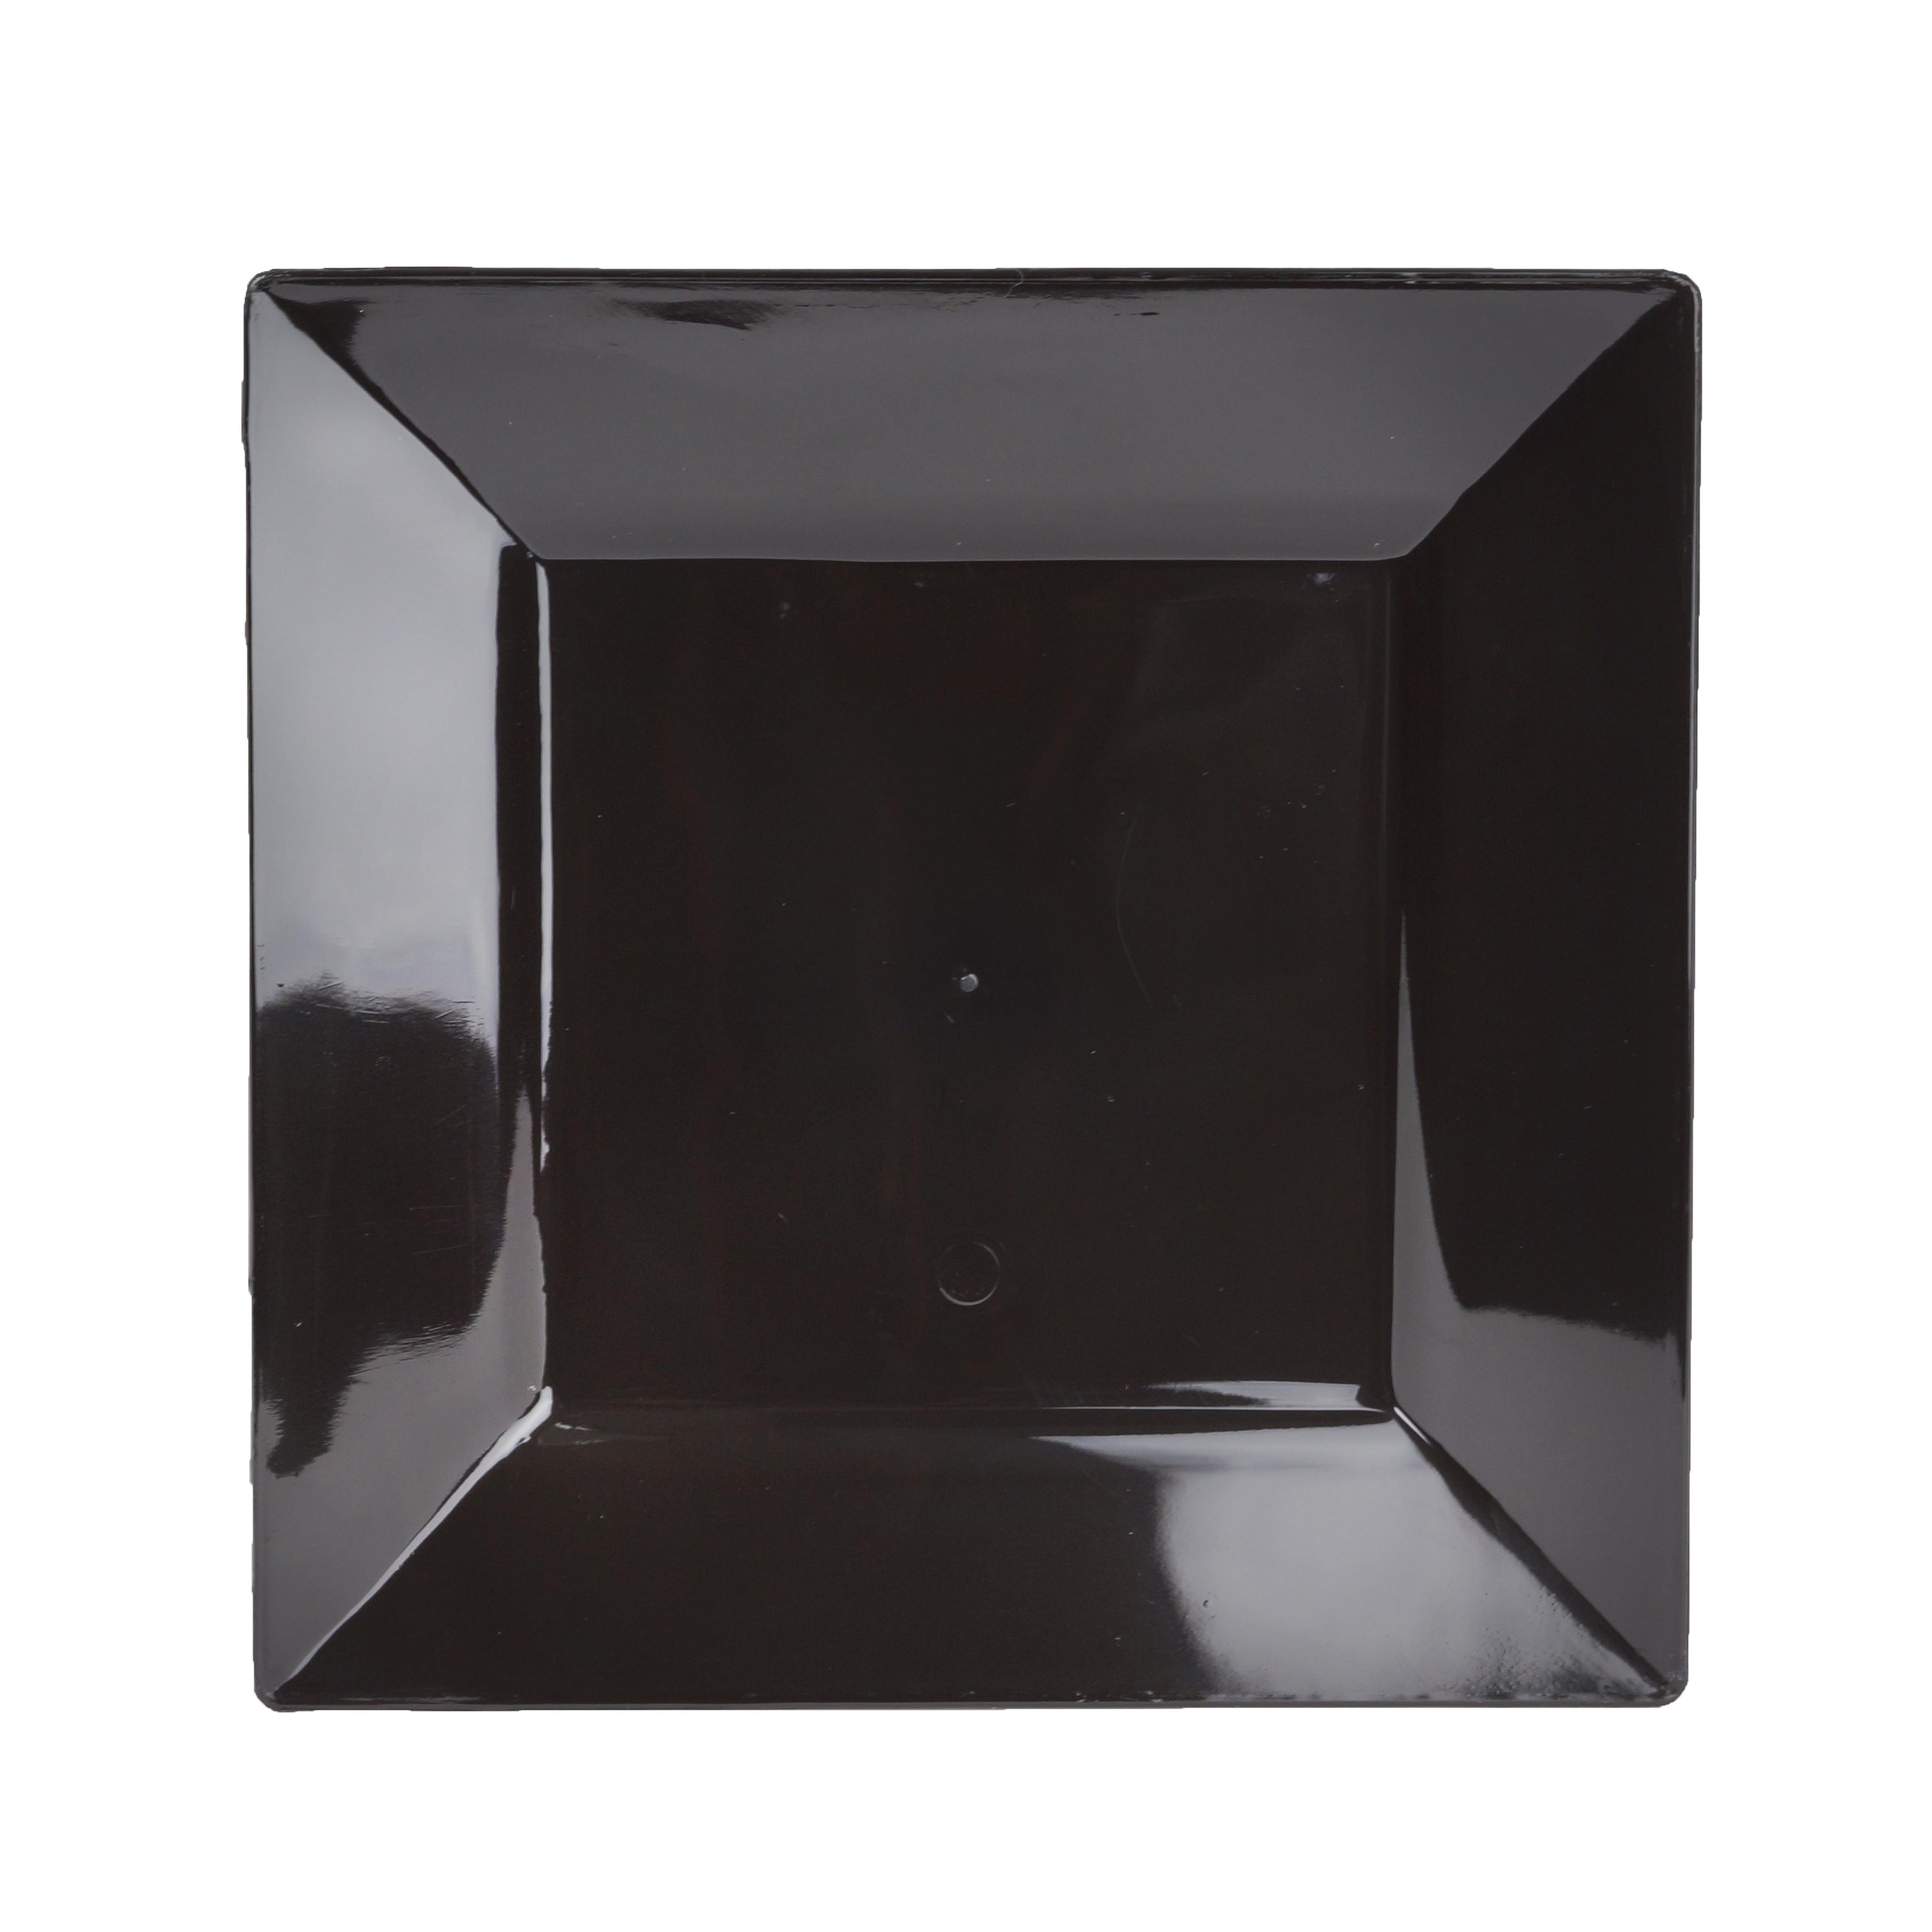 Plastic-6-5-034-Square-PLATES-Disposable-TABLEWARE-  sc 1 st  eBay & Plastic 6.5